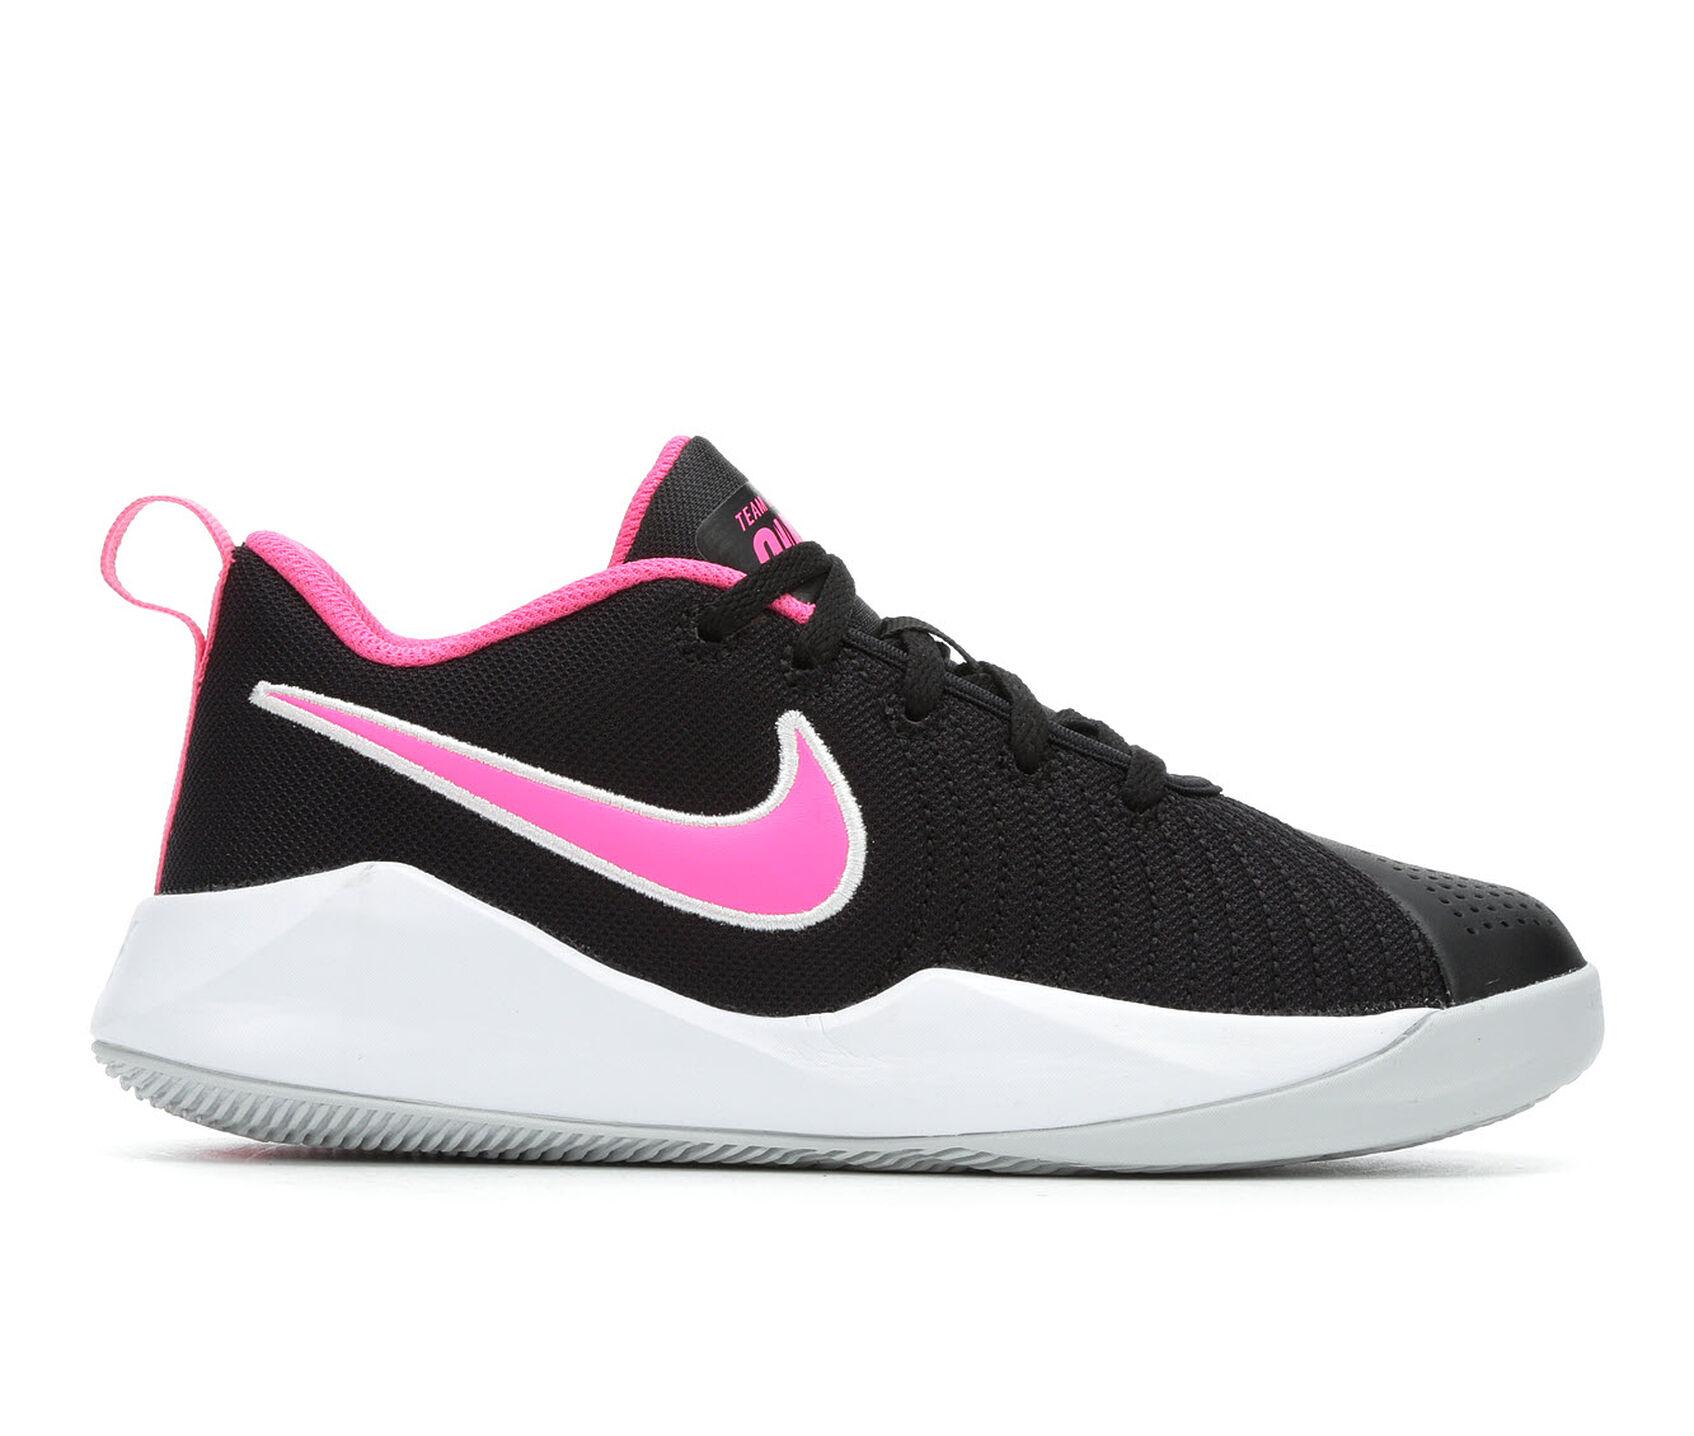 talla 40 rendimiento confiable moderno y elegante en moda nike basketball shoes official site off 57% - www.siteworxtn.com